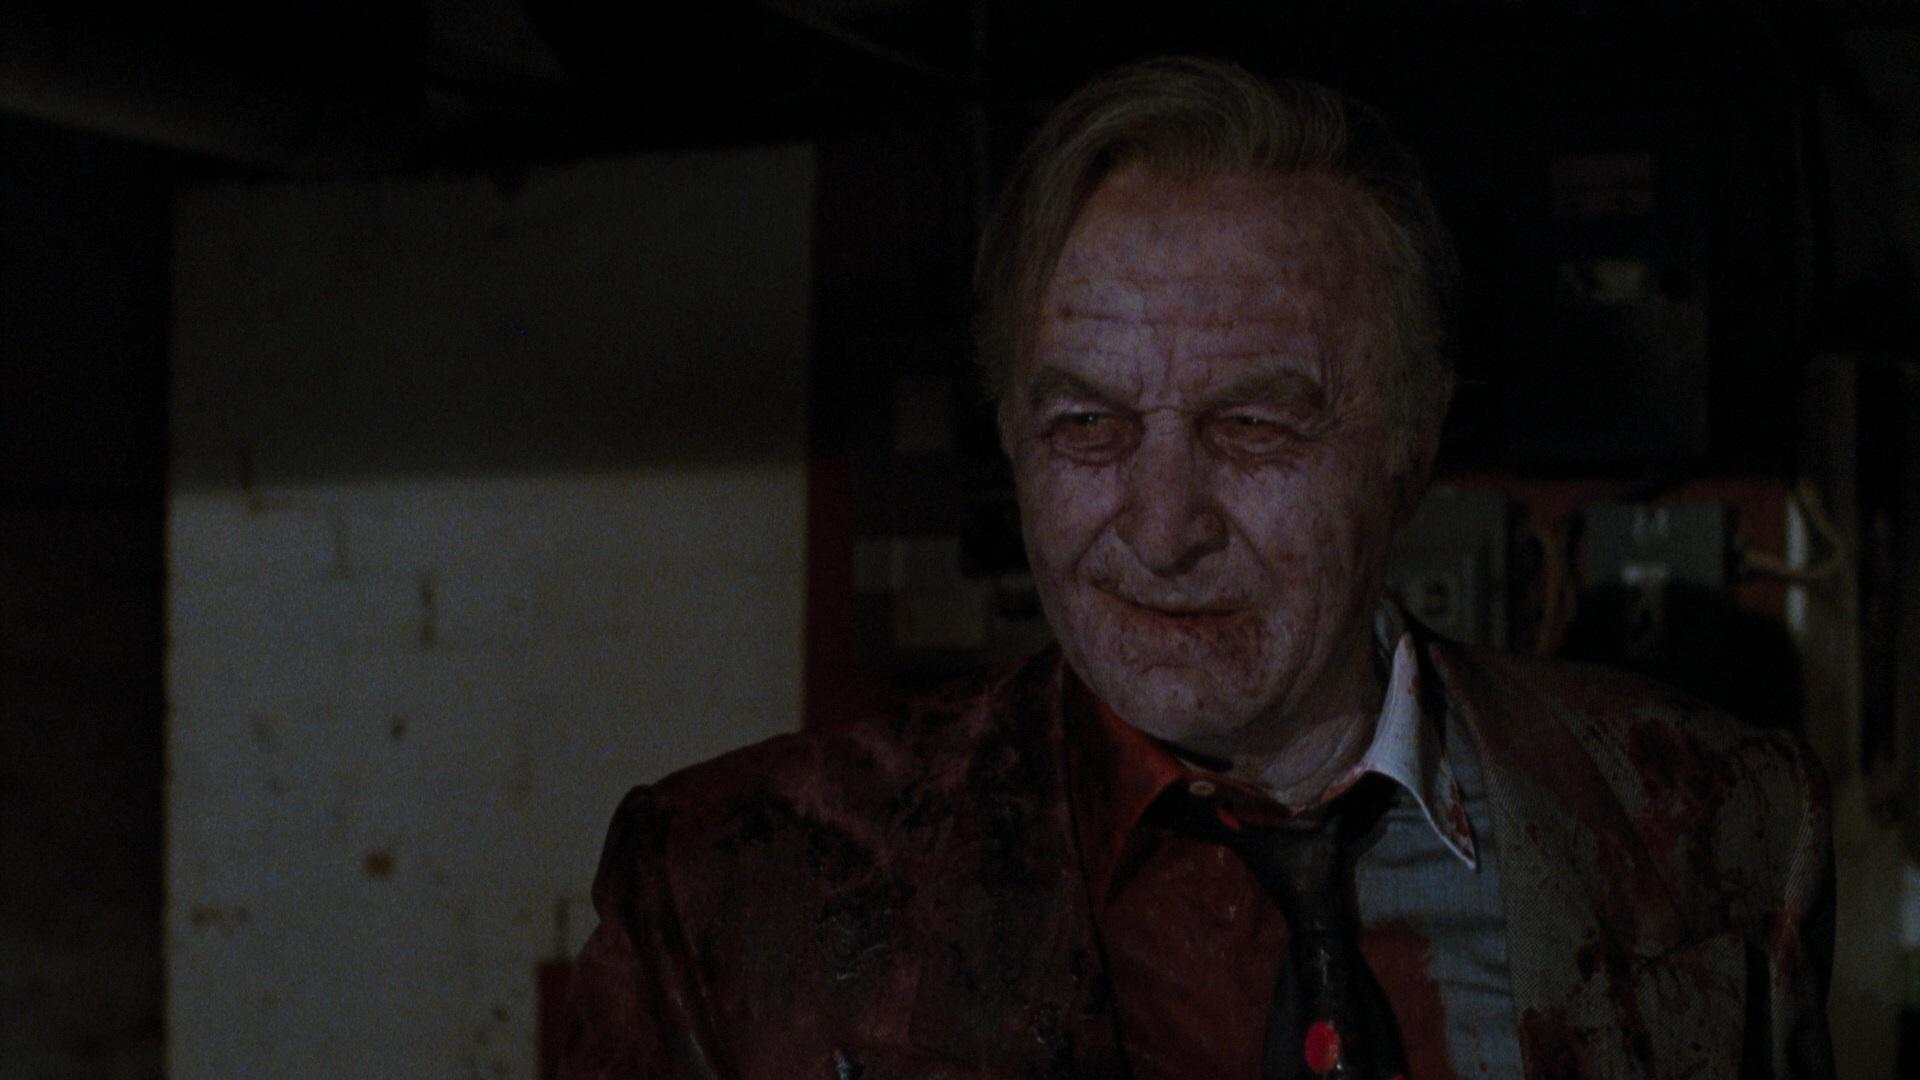 Robert Loggia as the vampirised Mafia boss Sal 'The Shark' Macelli in Innocent Blood (1992)